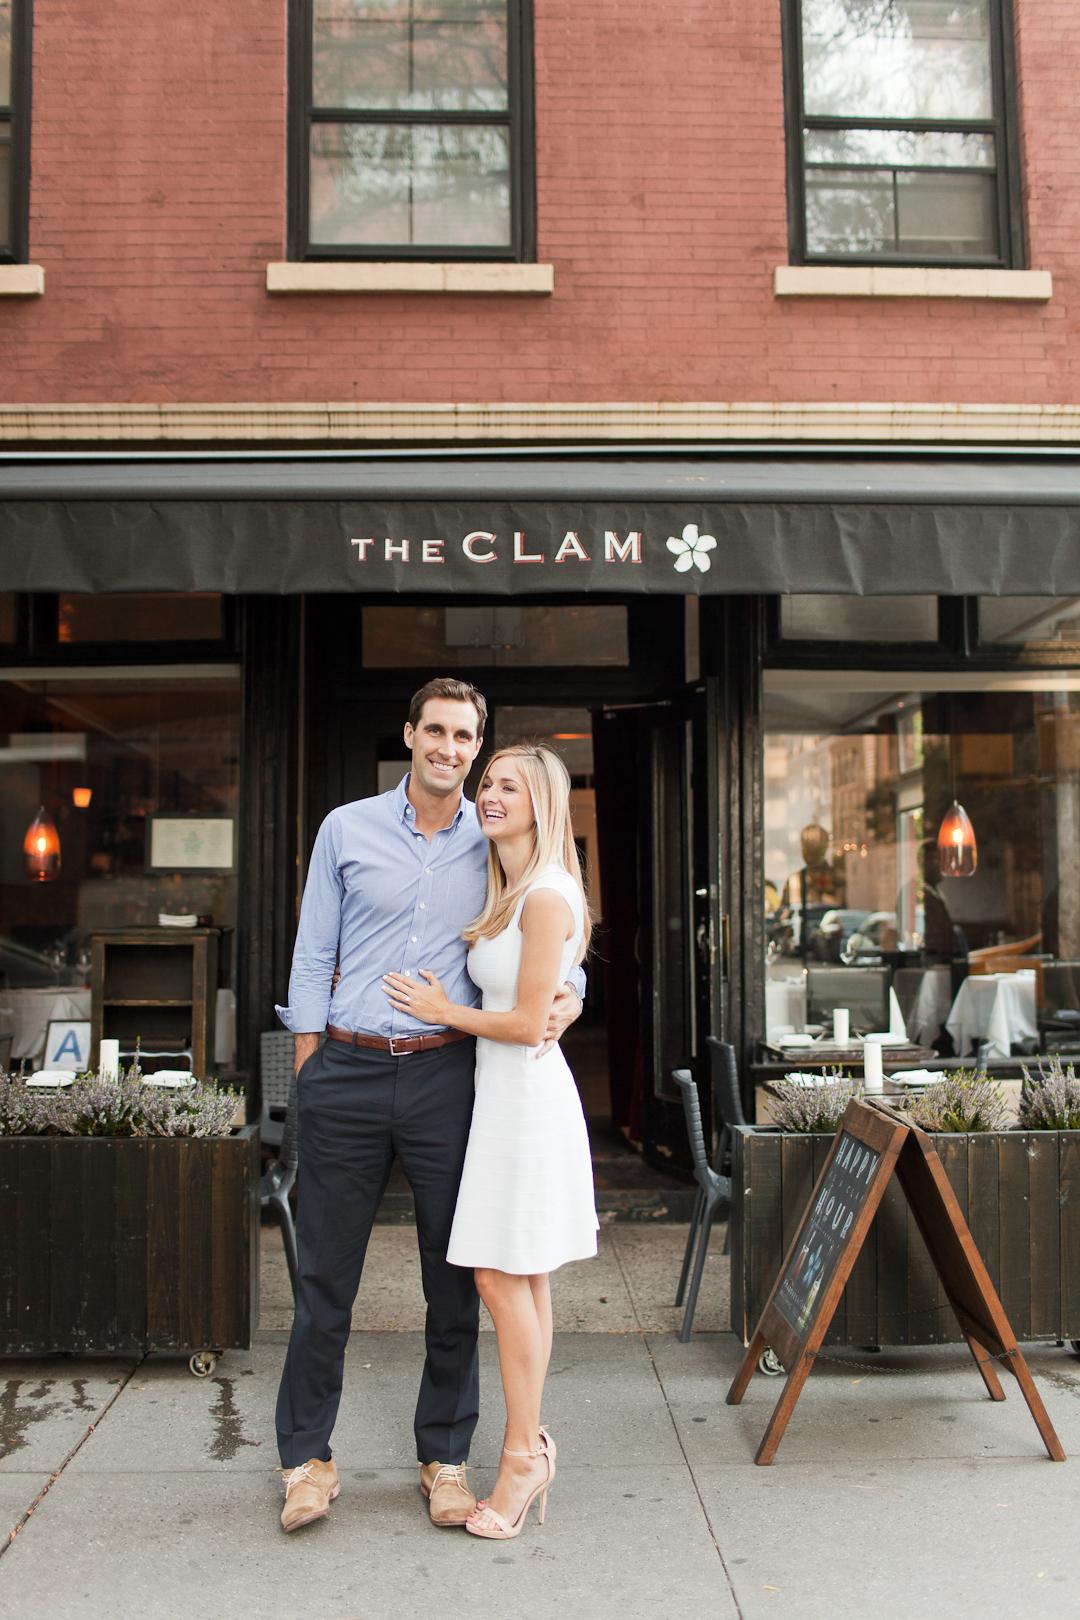 Melissa Kruse Photography - Daniece & Chris West Village Engagement Photos-39.jpg